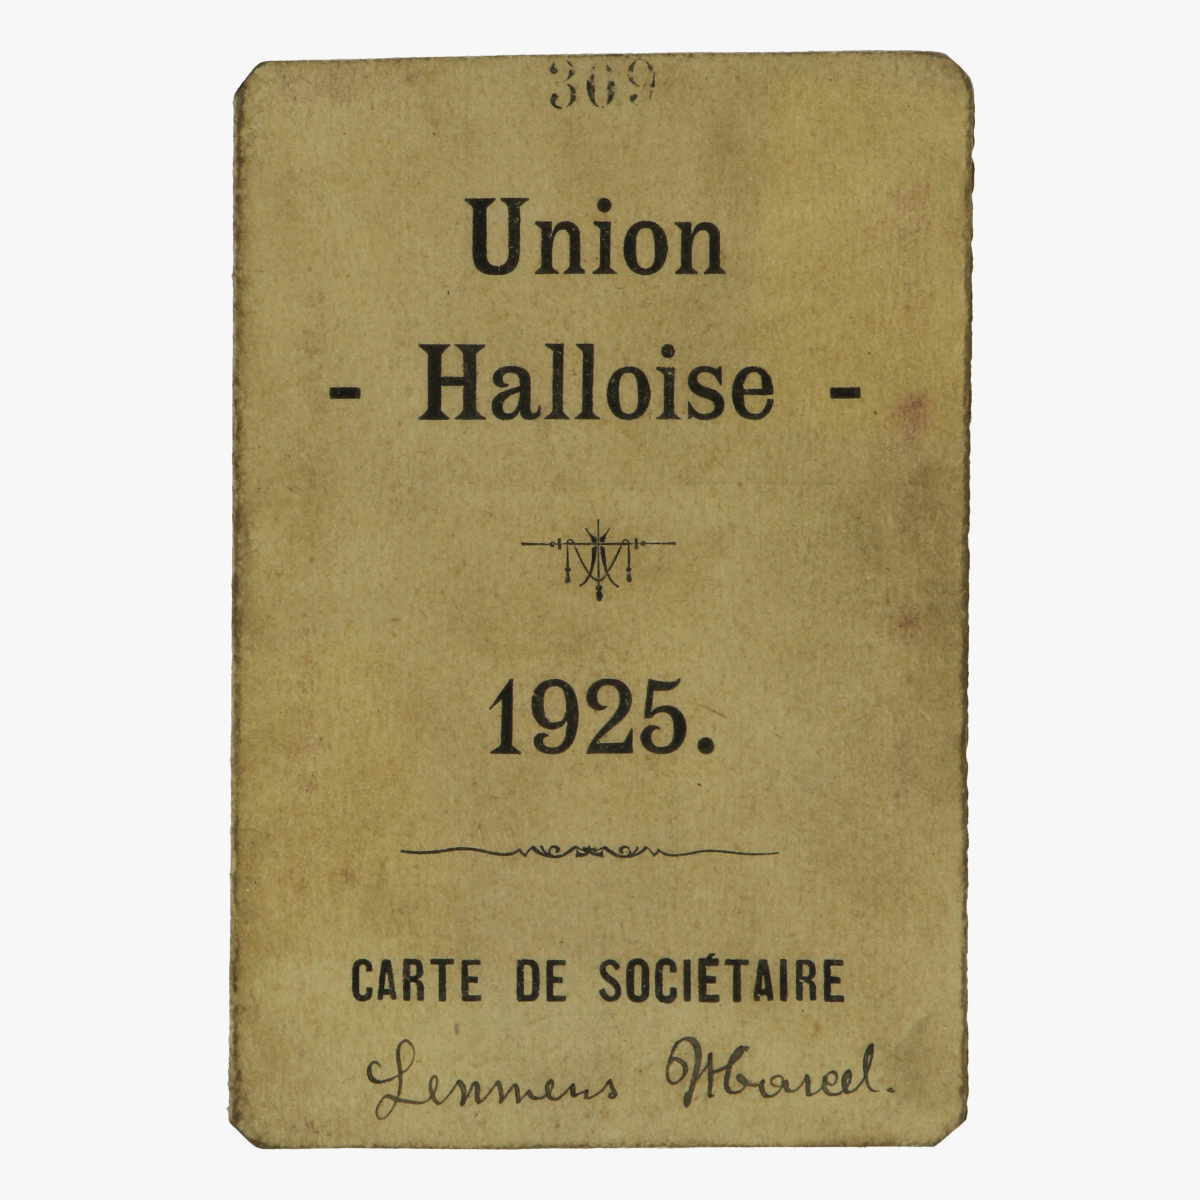 Afbeeldingen van carte de sociétaire union halloise 1925